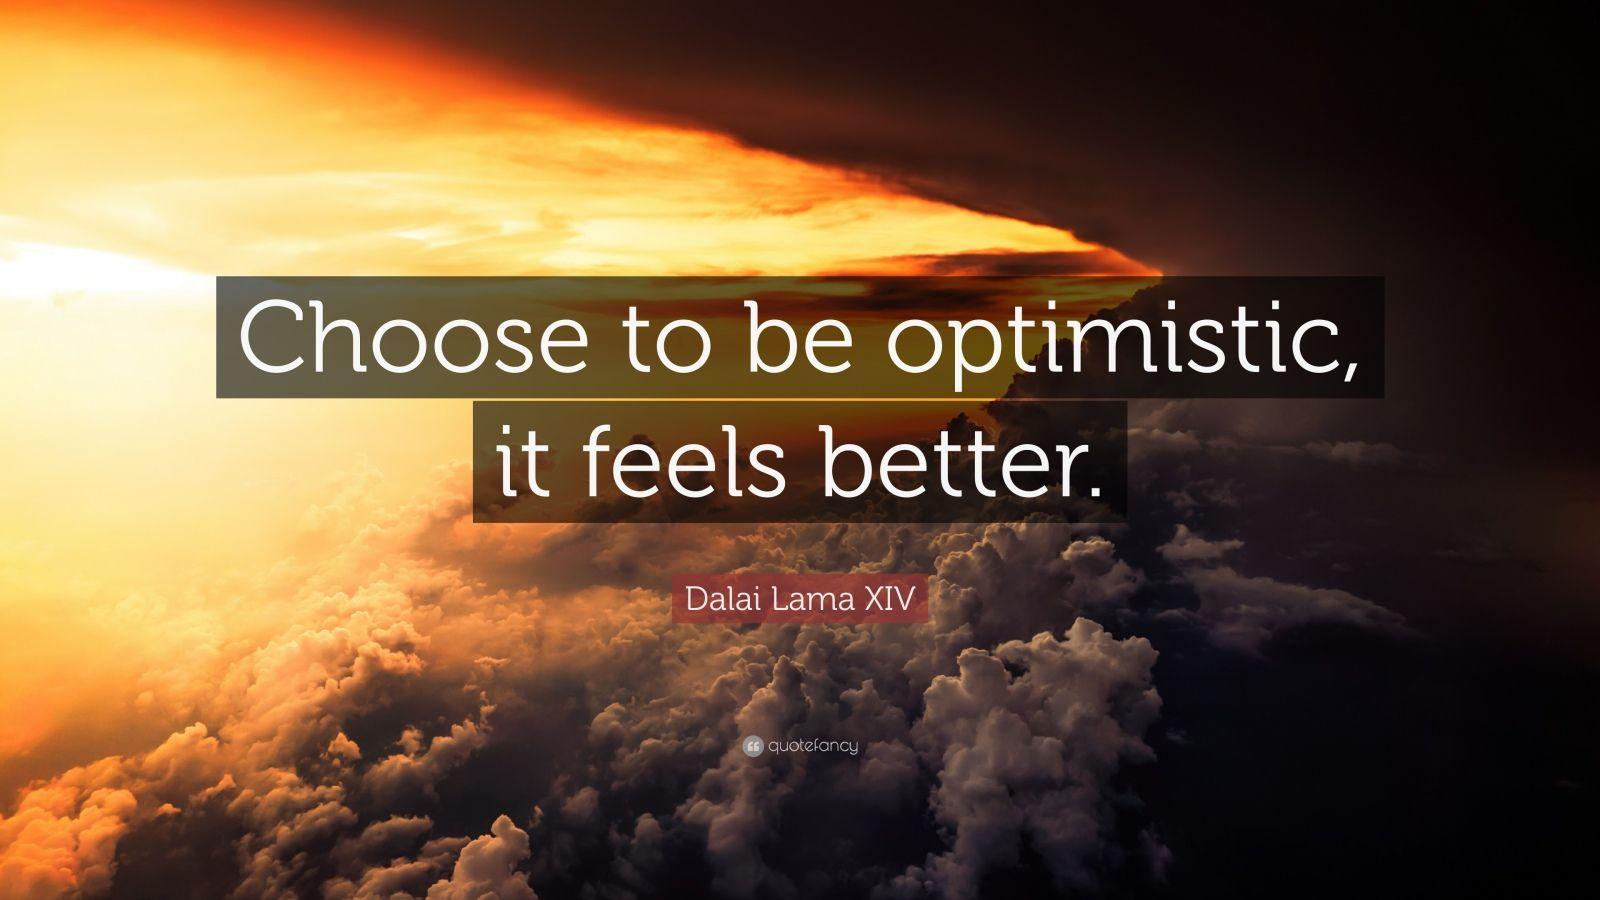 Dalai Lama Quotes Wallpapers Dalai Lama Xiv Quote Choose To Be Optimistic It Feels